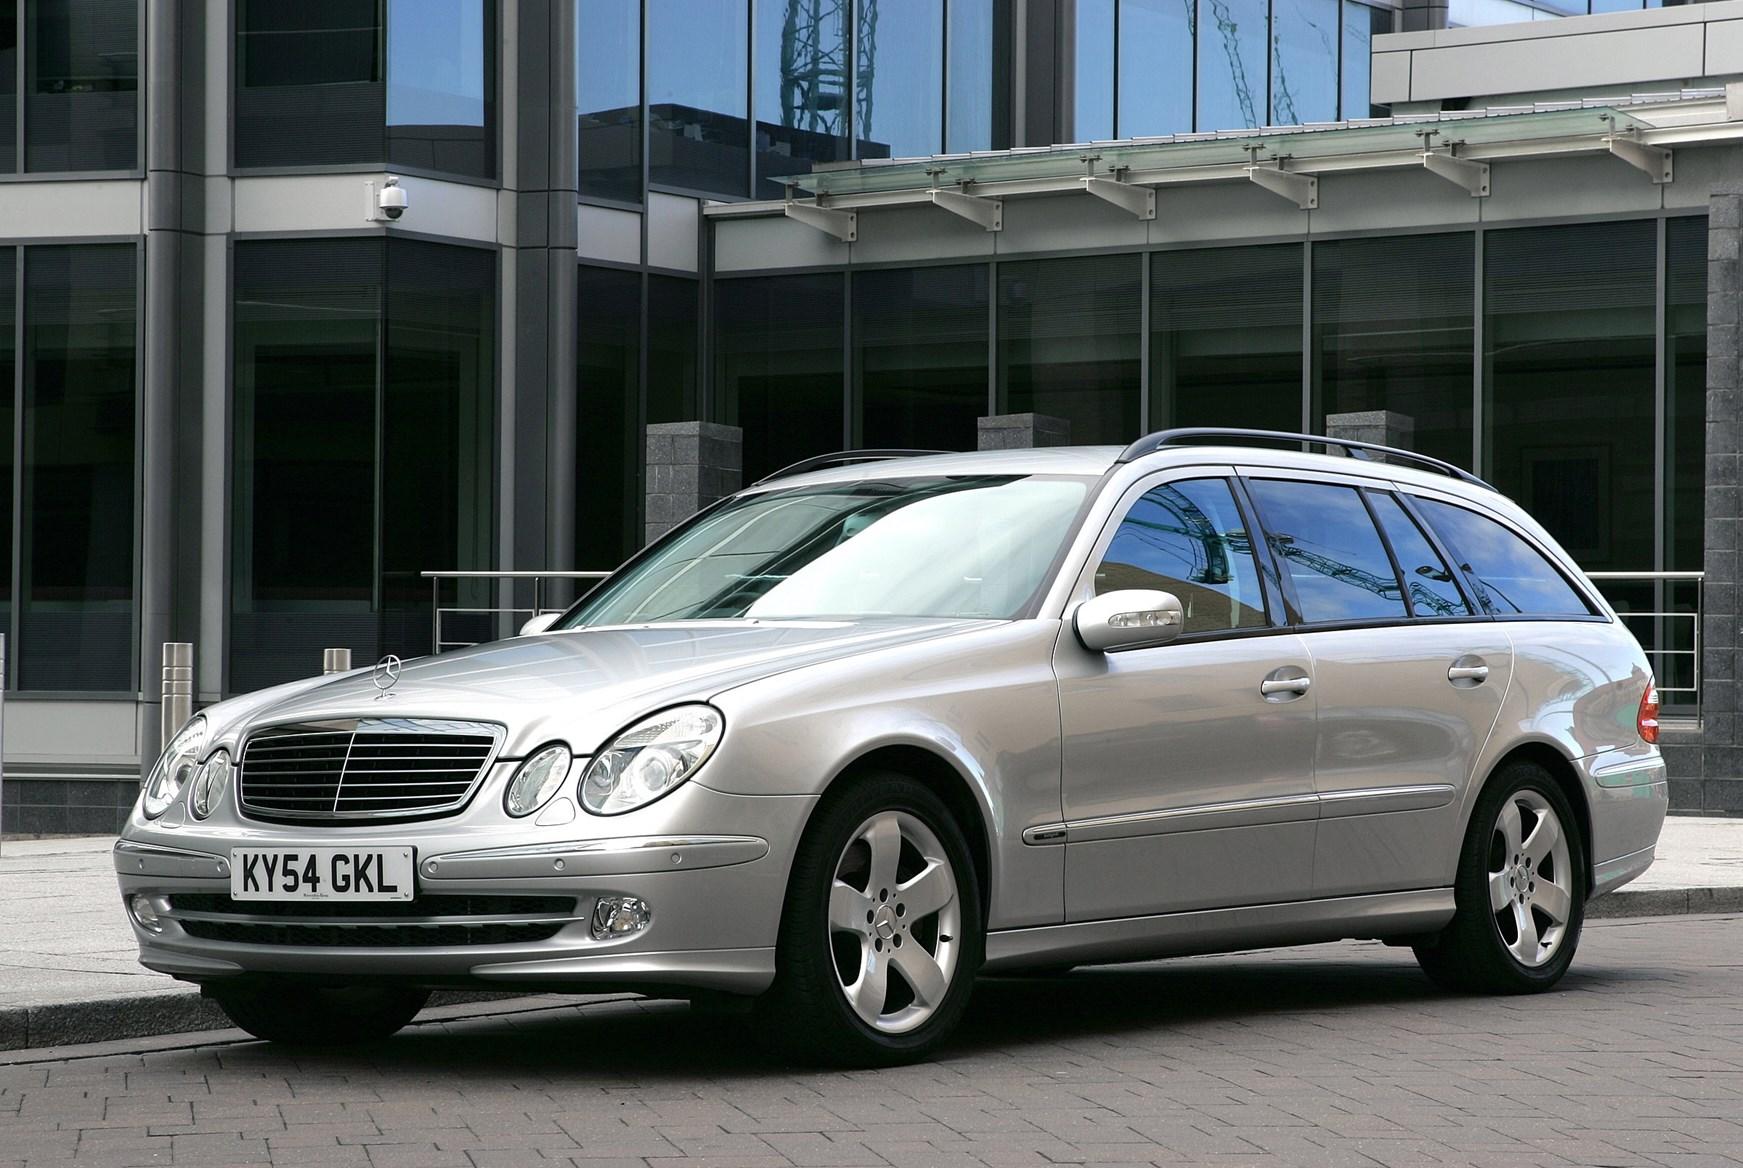 Mercedes benz e class estate review 2003 2008 parkers for Mercedes benz employee discount